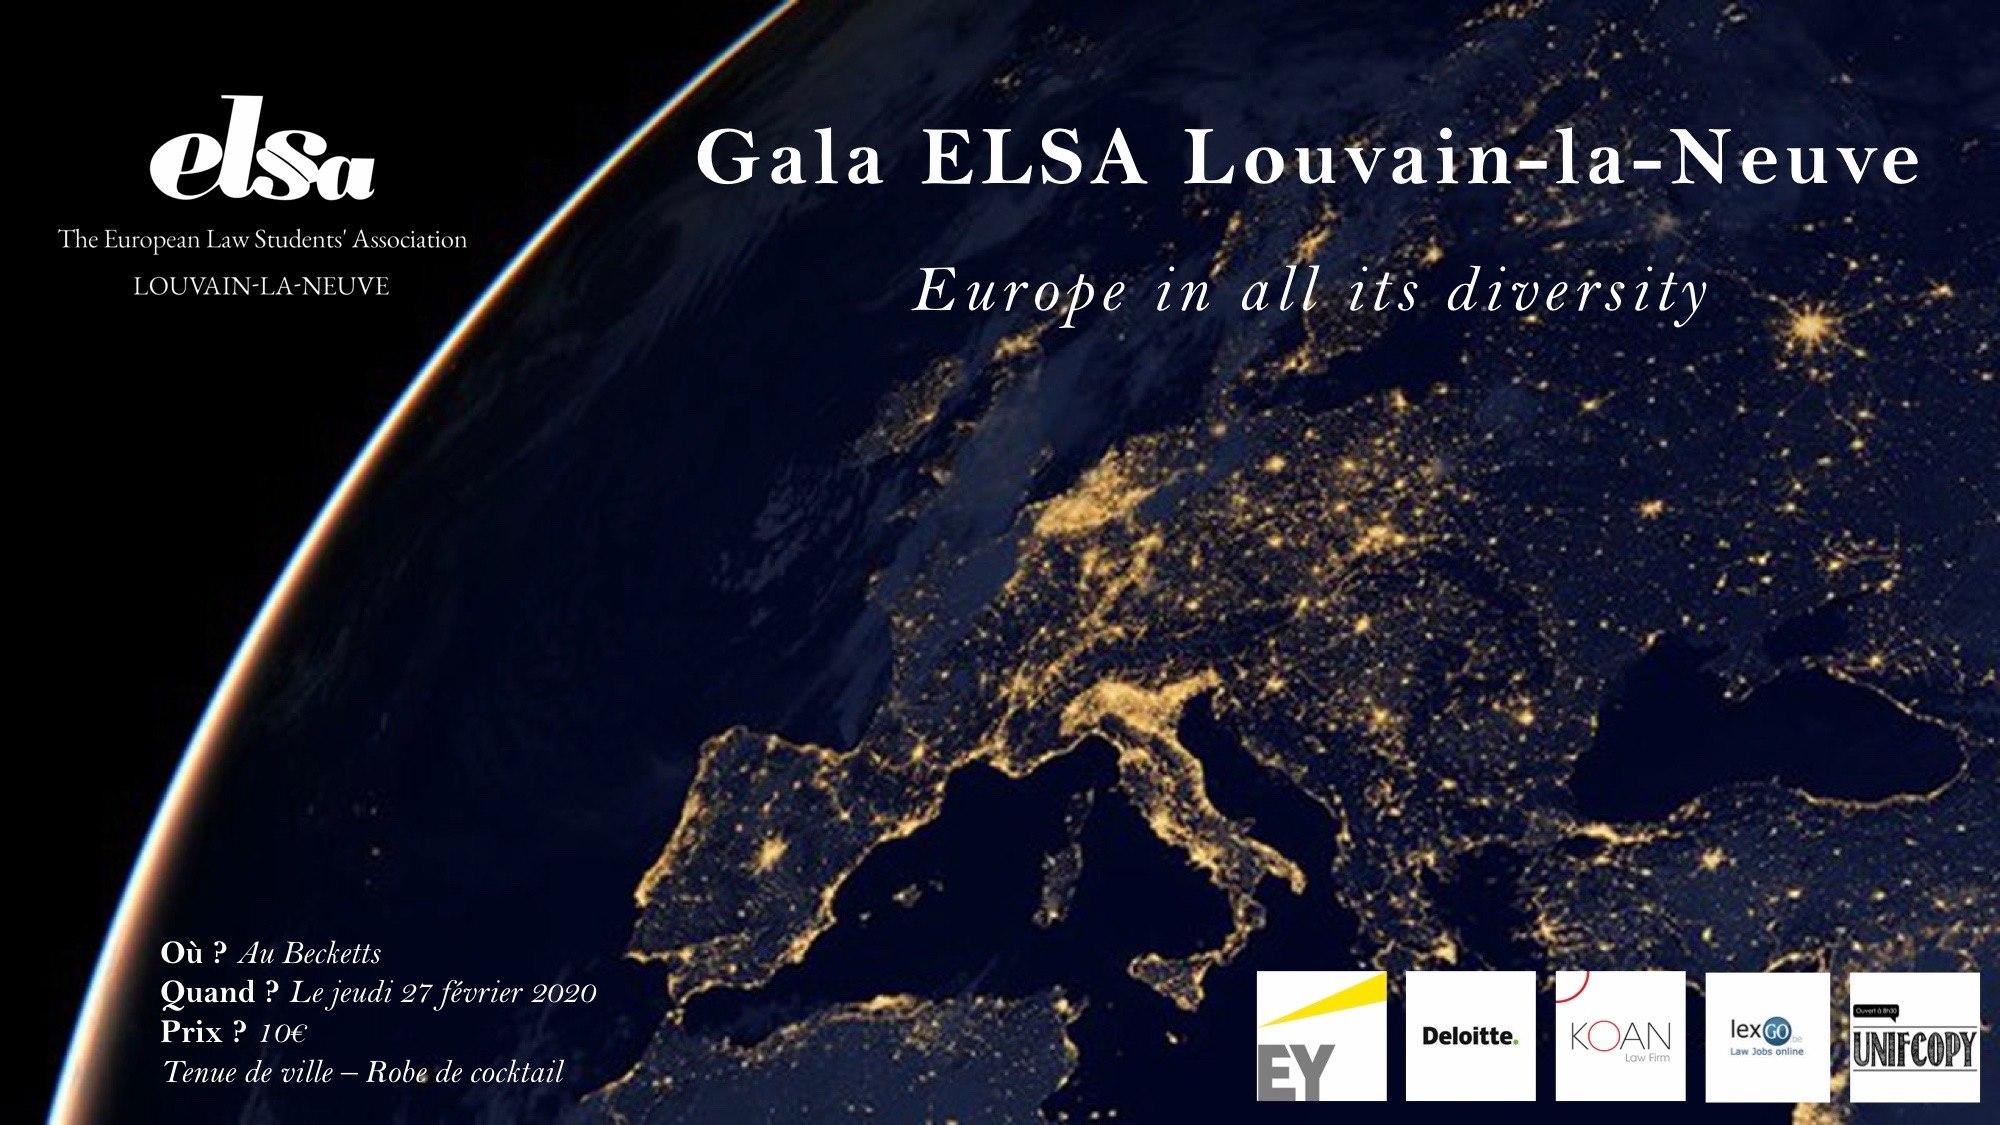 GALA ELSA Louvain-la-Neuve